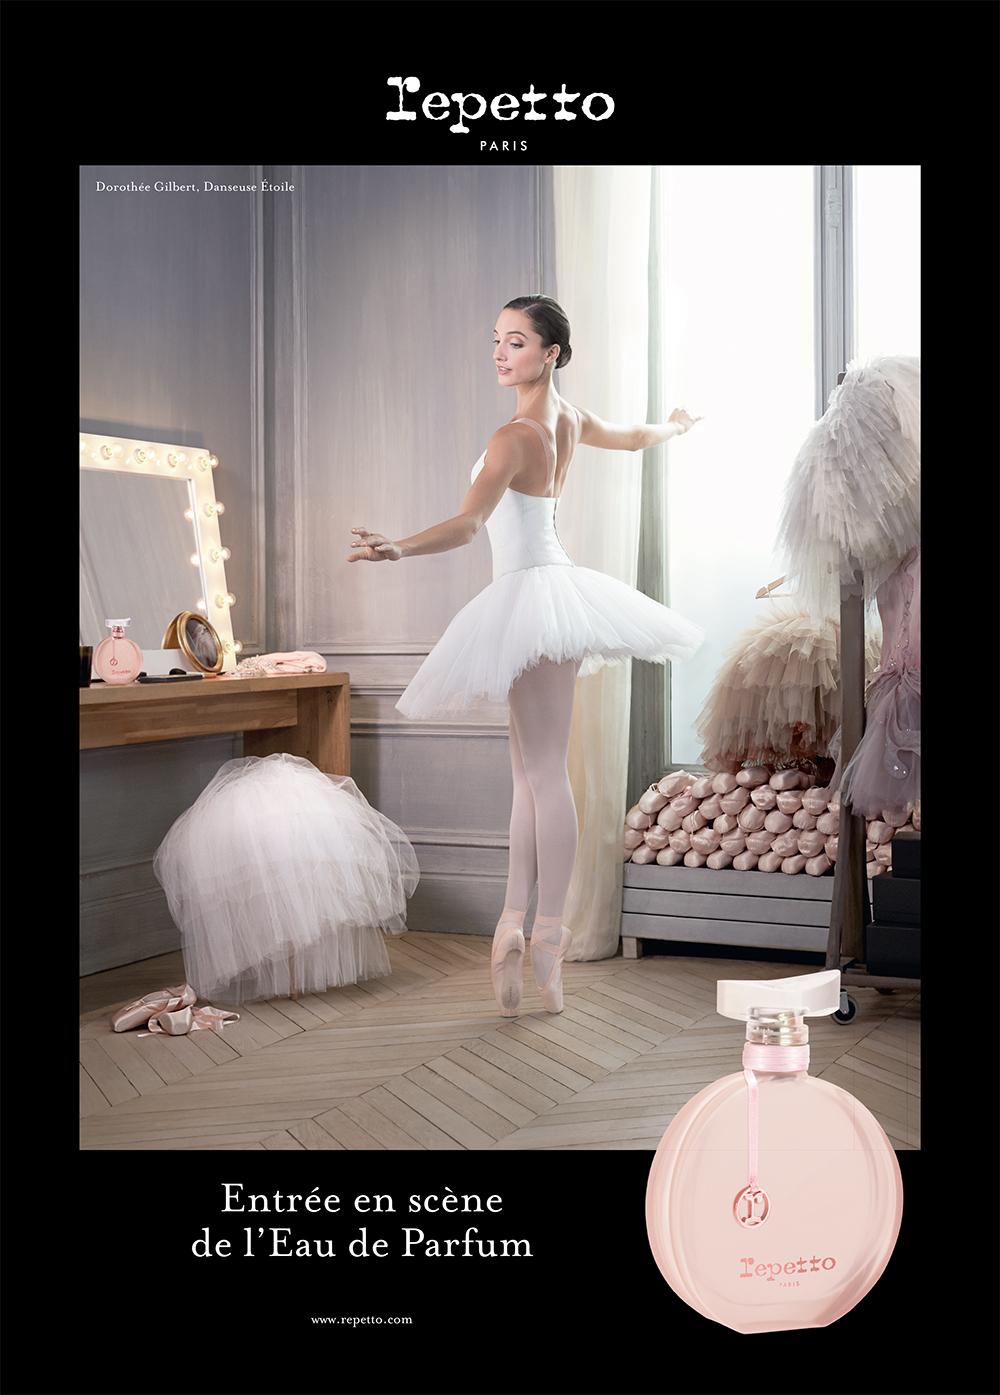 Bort Eau De Parfum Campagne RepettoJames BdoWQrxeEC